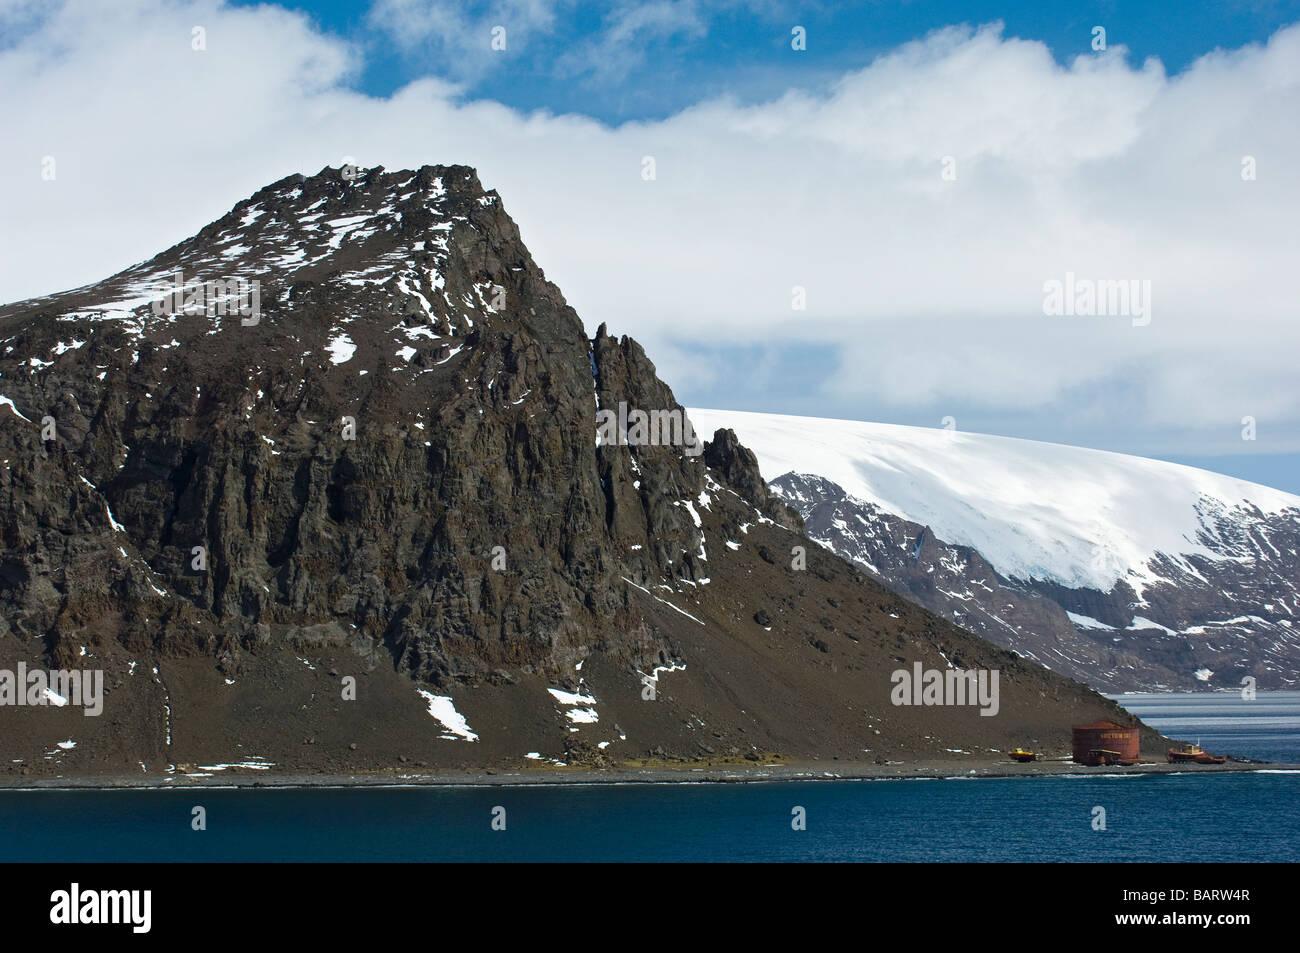 Mountain Towers above Arctowski Station. Admiralty Bay, King George Island, South Shetland Islands, Antarctica. Stock Photo